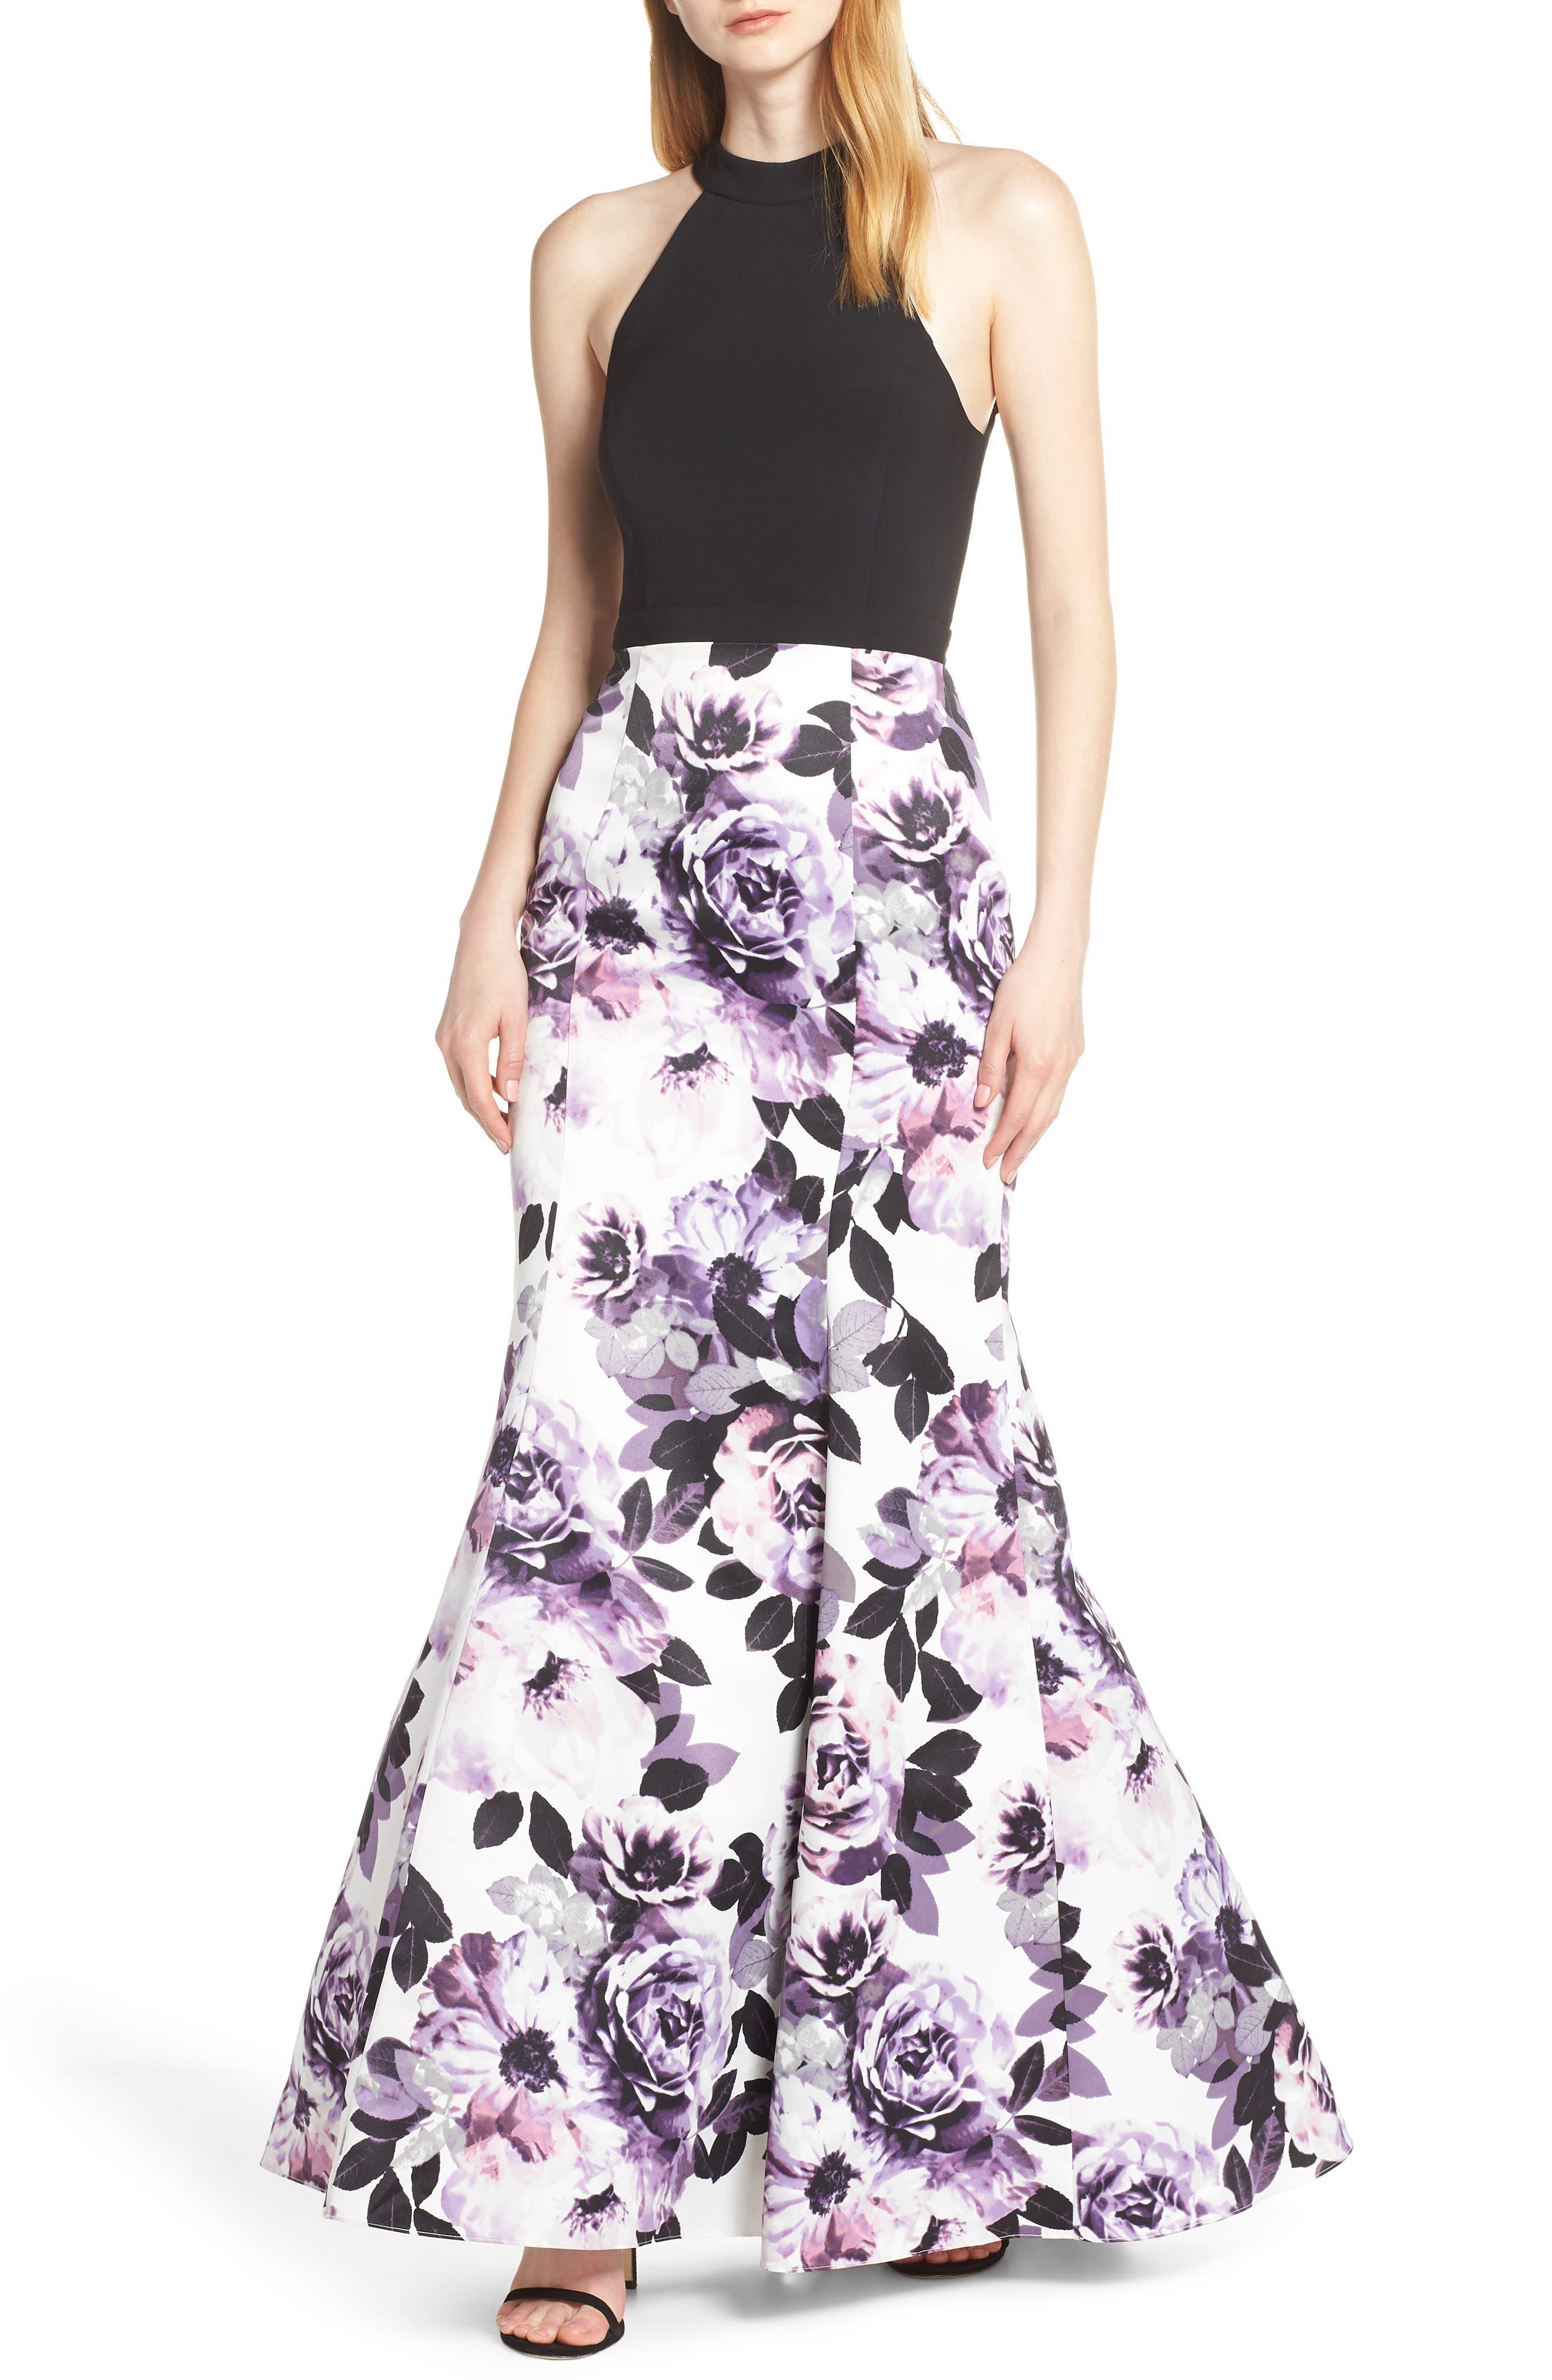 Blondie Nites Floral Print Lattice Back Evening Dress, Black